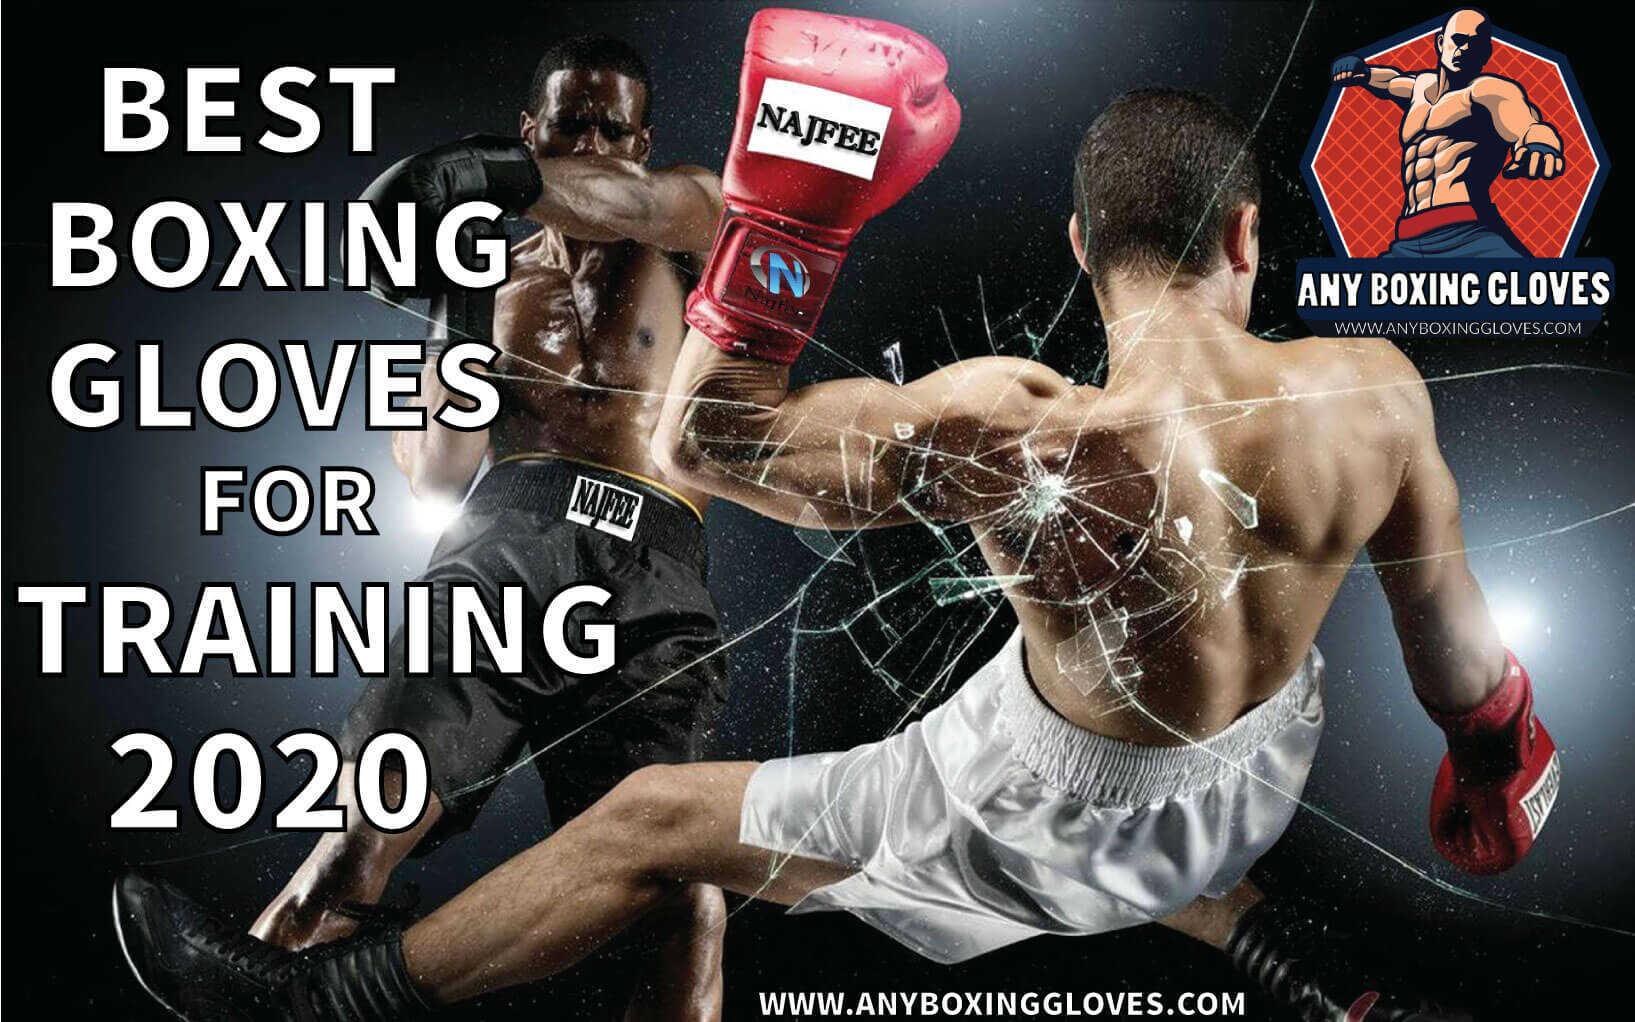 Best Boxing Gloves for Training